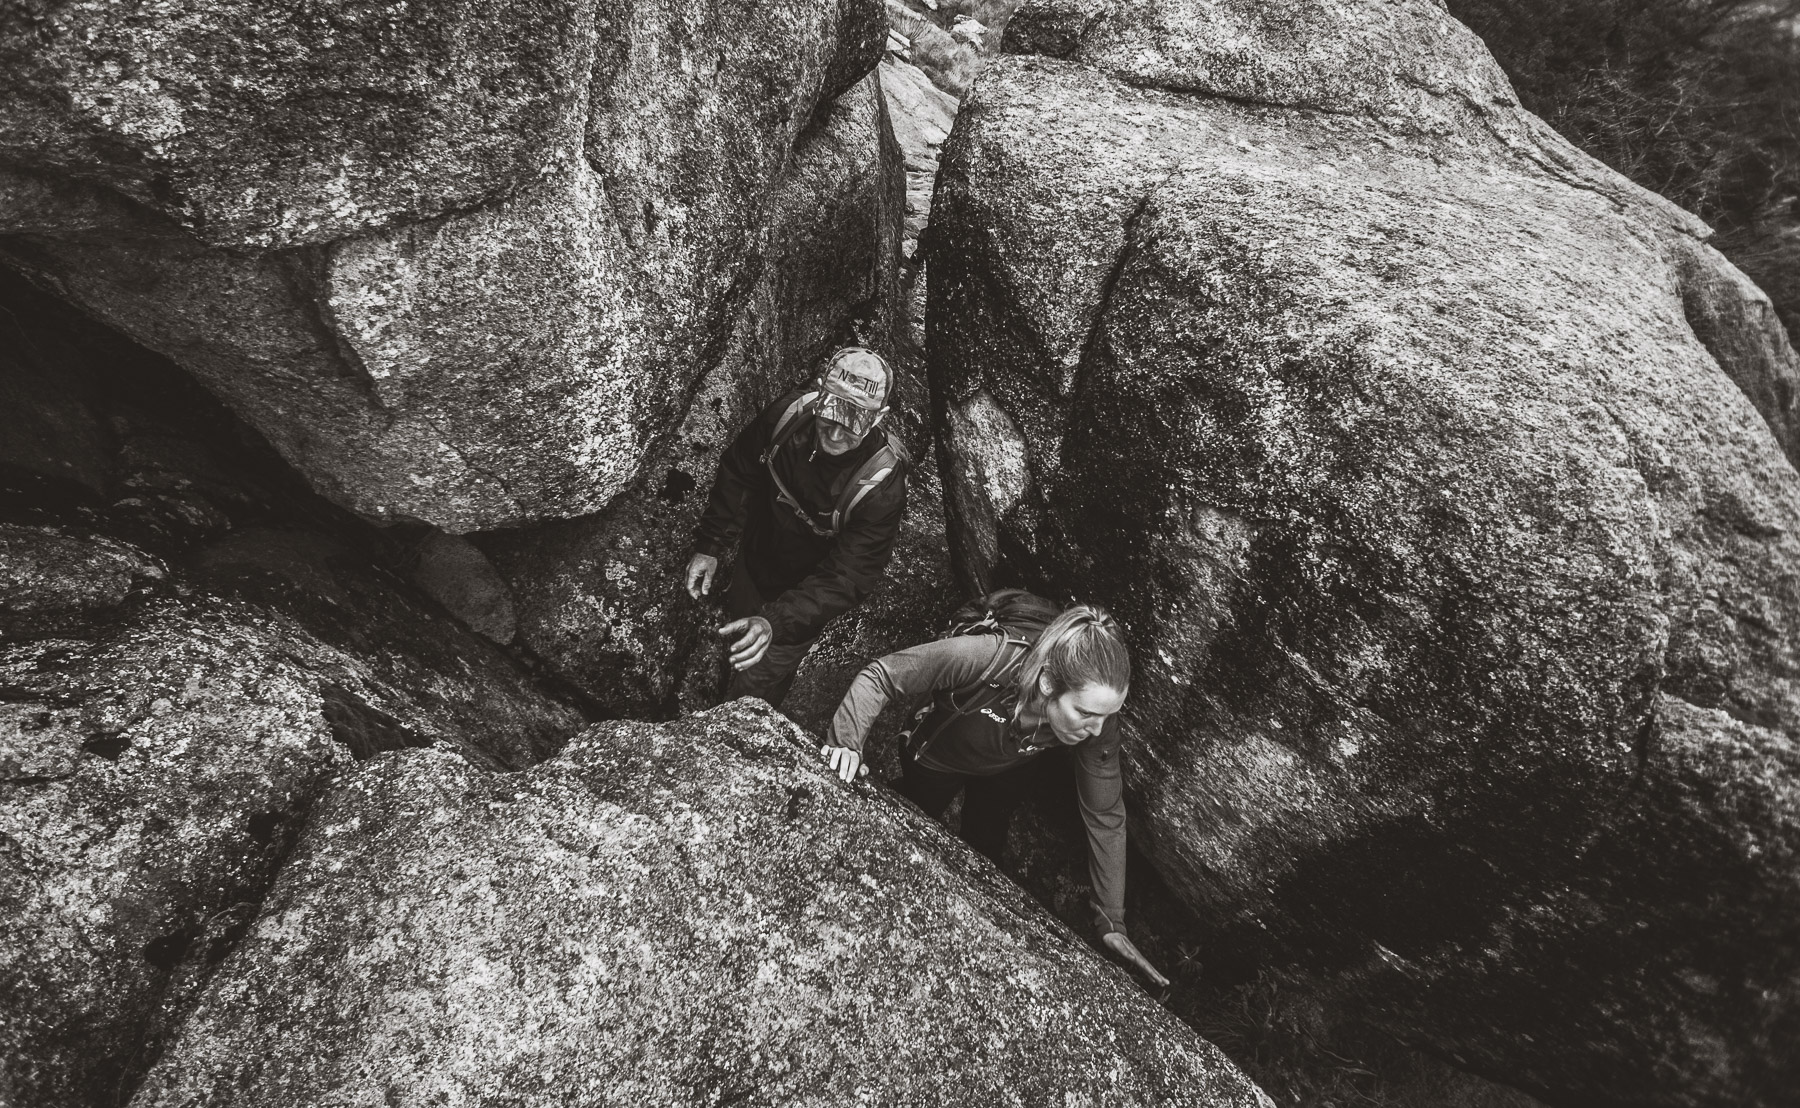 Spanish Cave 11-6-16 (3 of 19).JPG